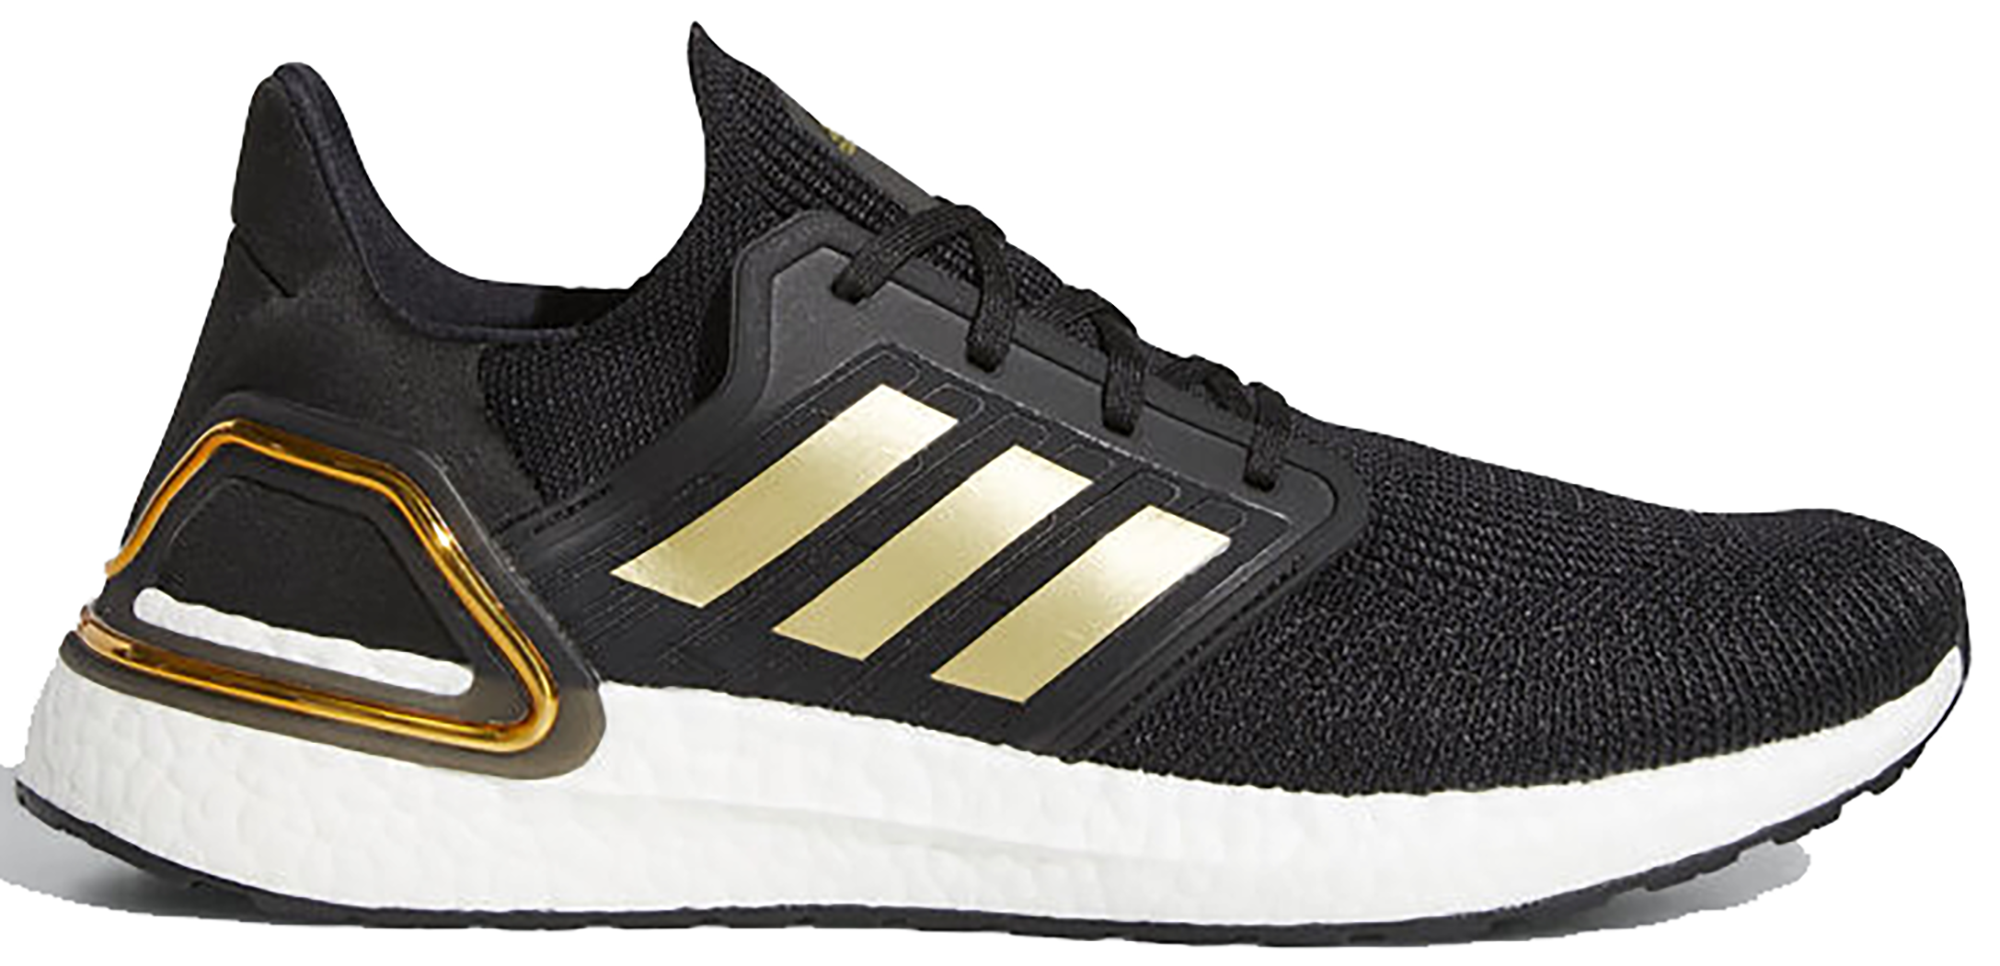 adidas Ultra Boost 20 Black Gold White